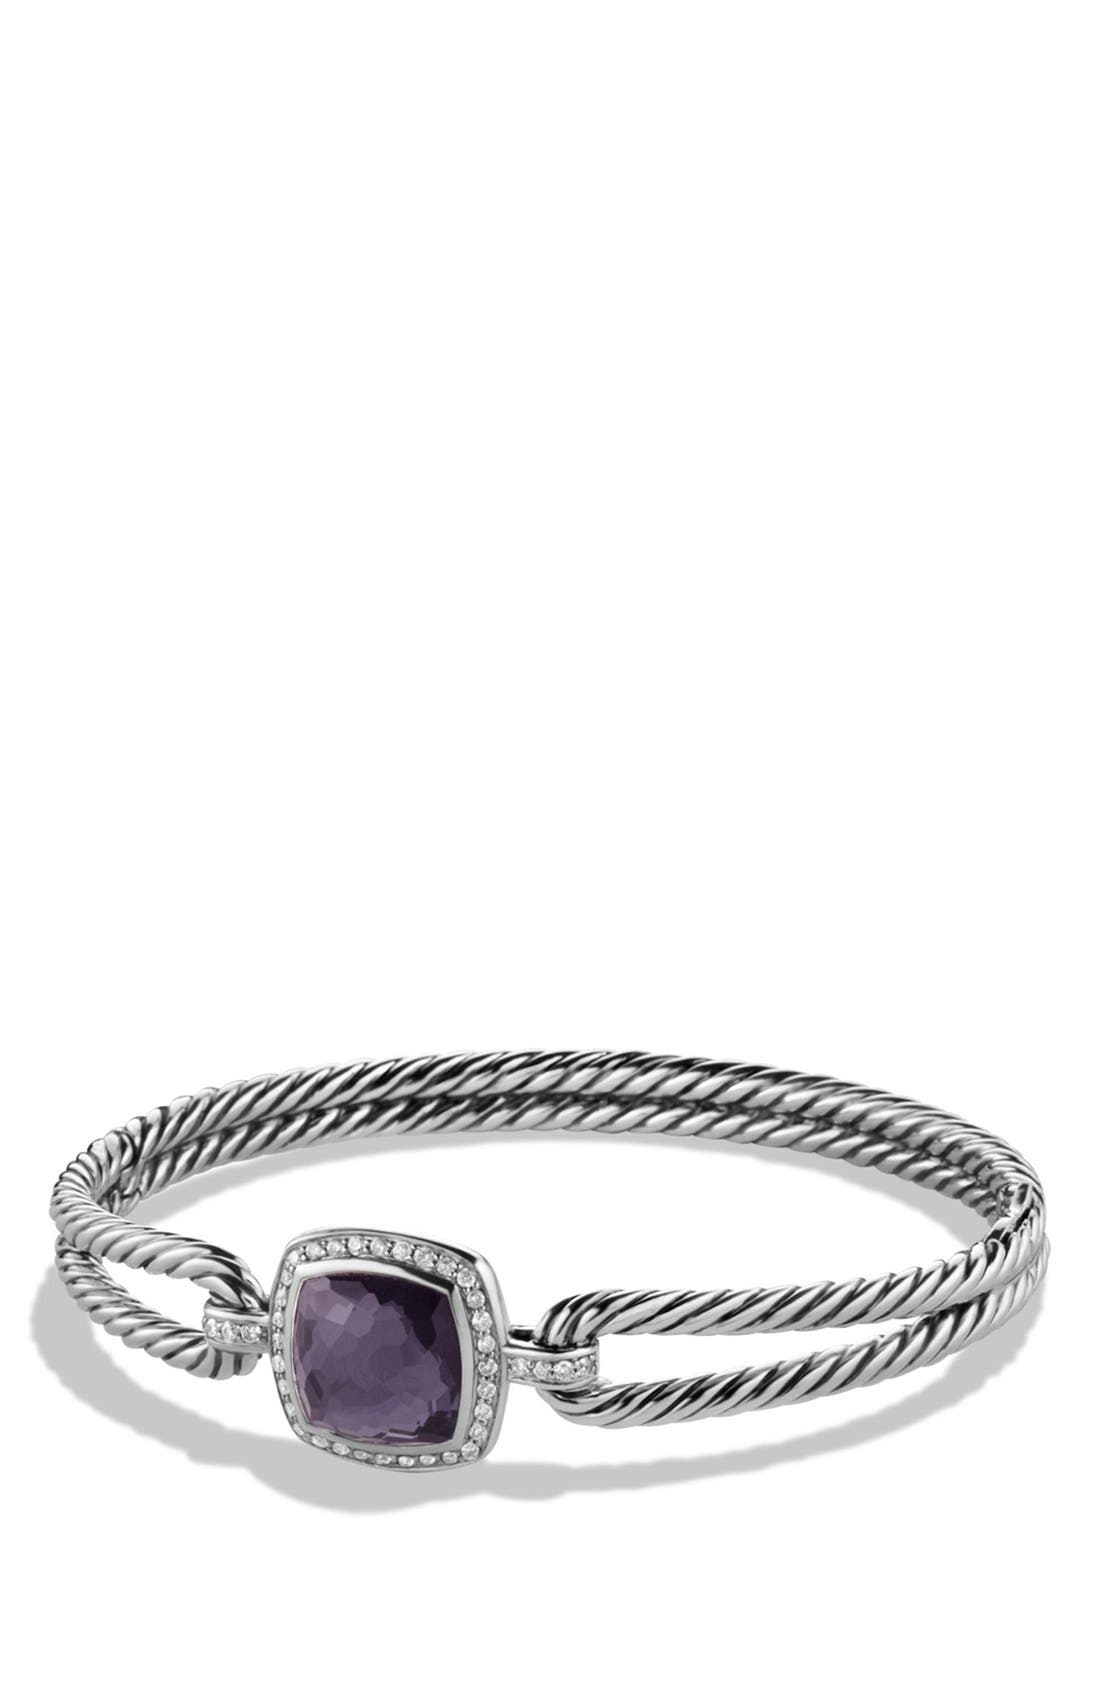 DAVID YURMAN 'Albion' Bracelet with Semiprecious Stone and Diamonds, Main, color, BLACK ORCHID